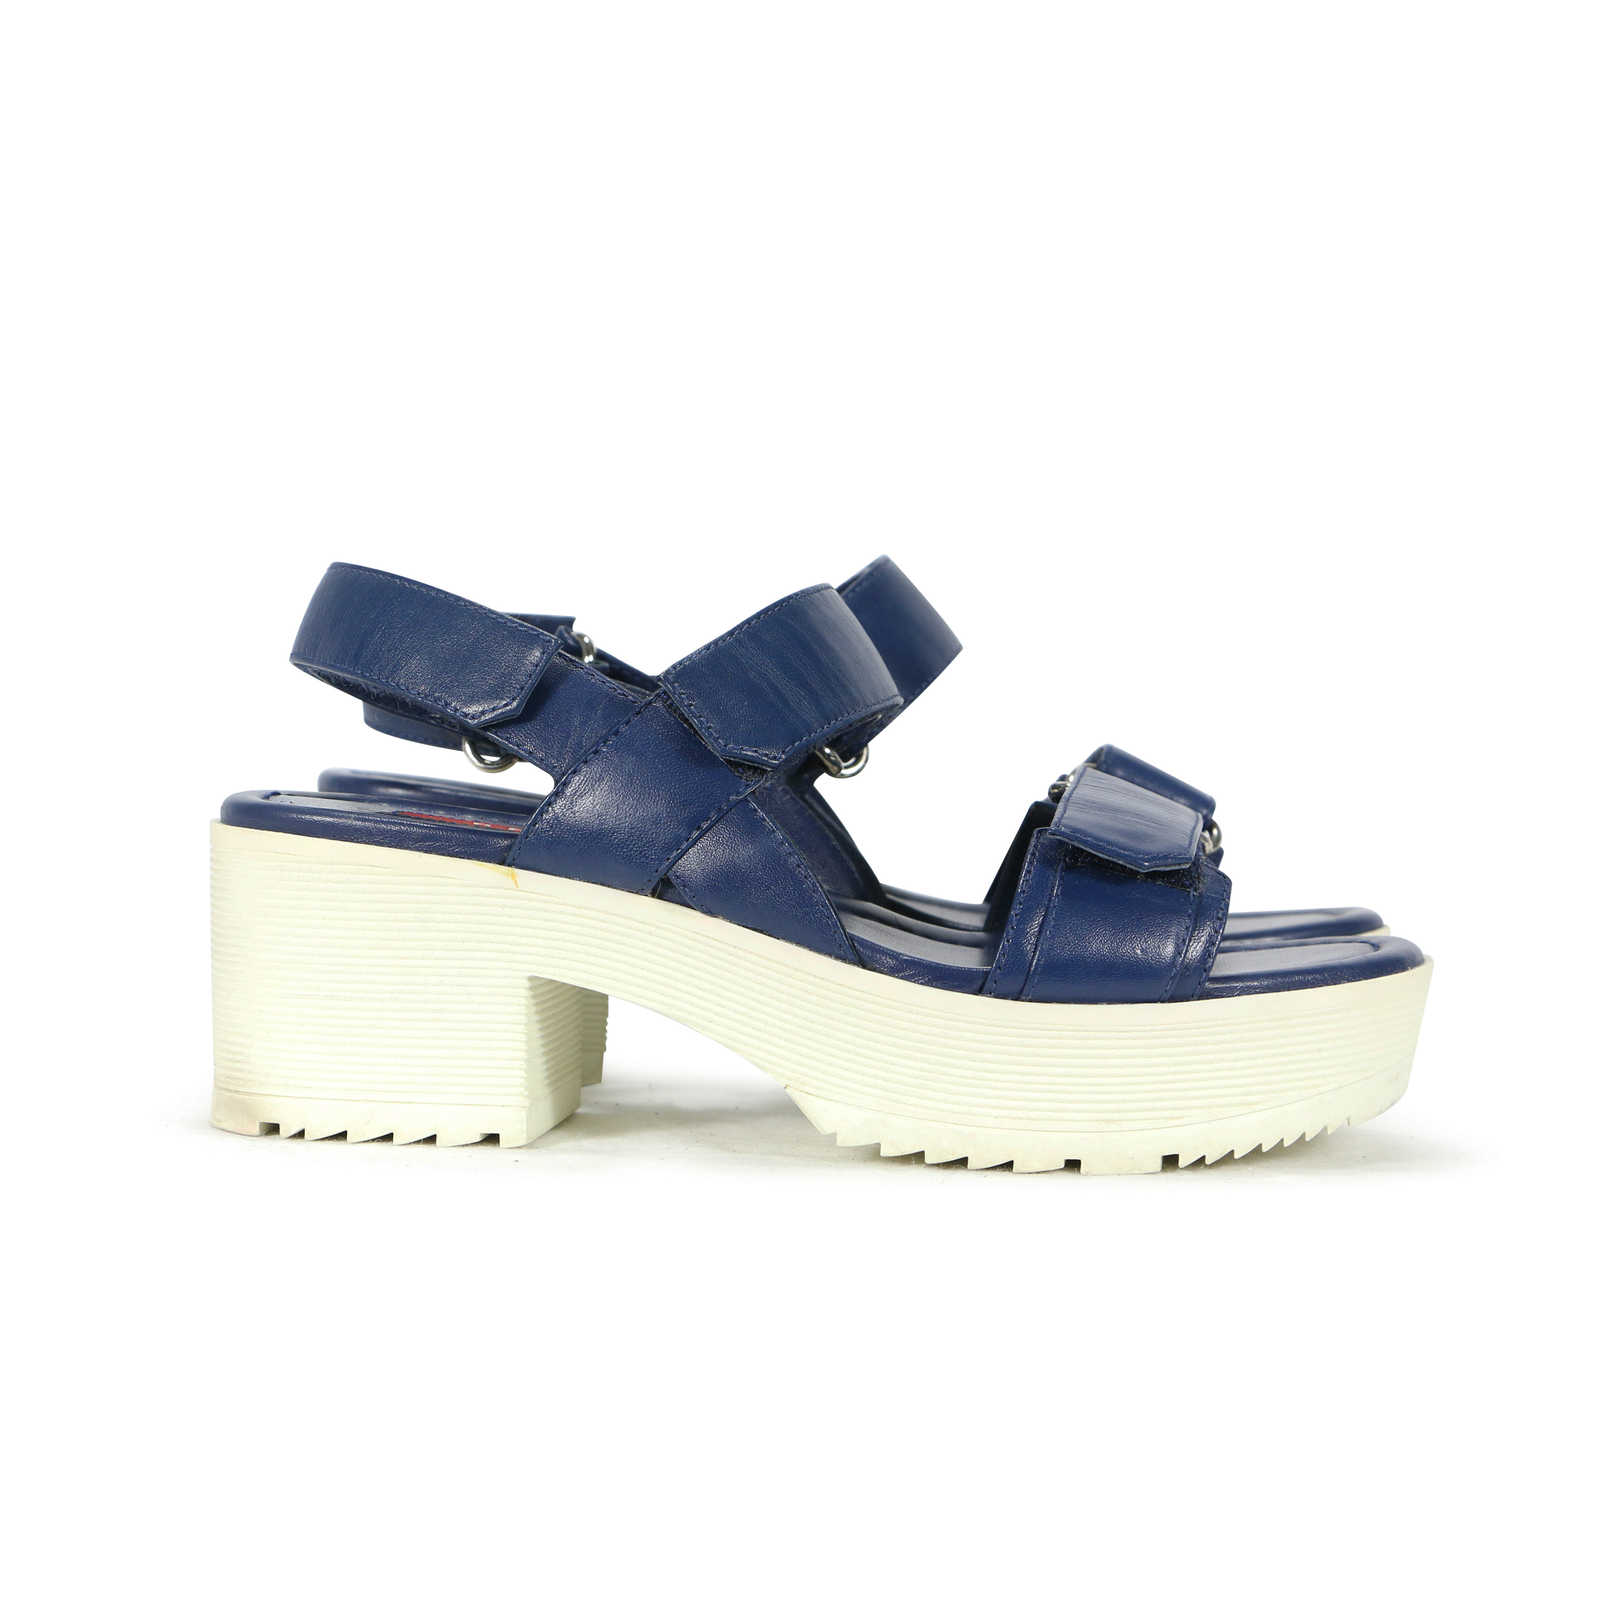 Prada Platform Velcro Sandals 5Y7mU